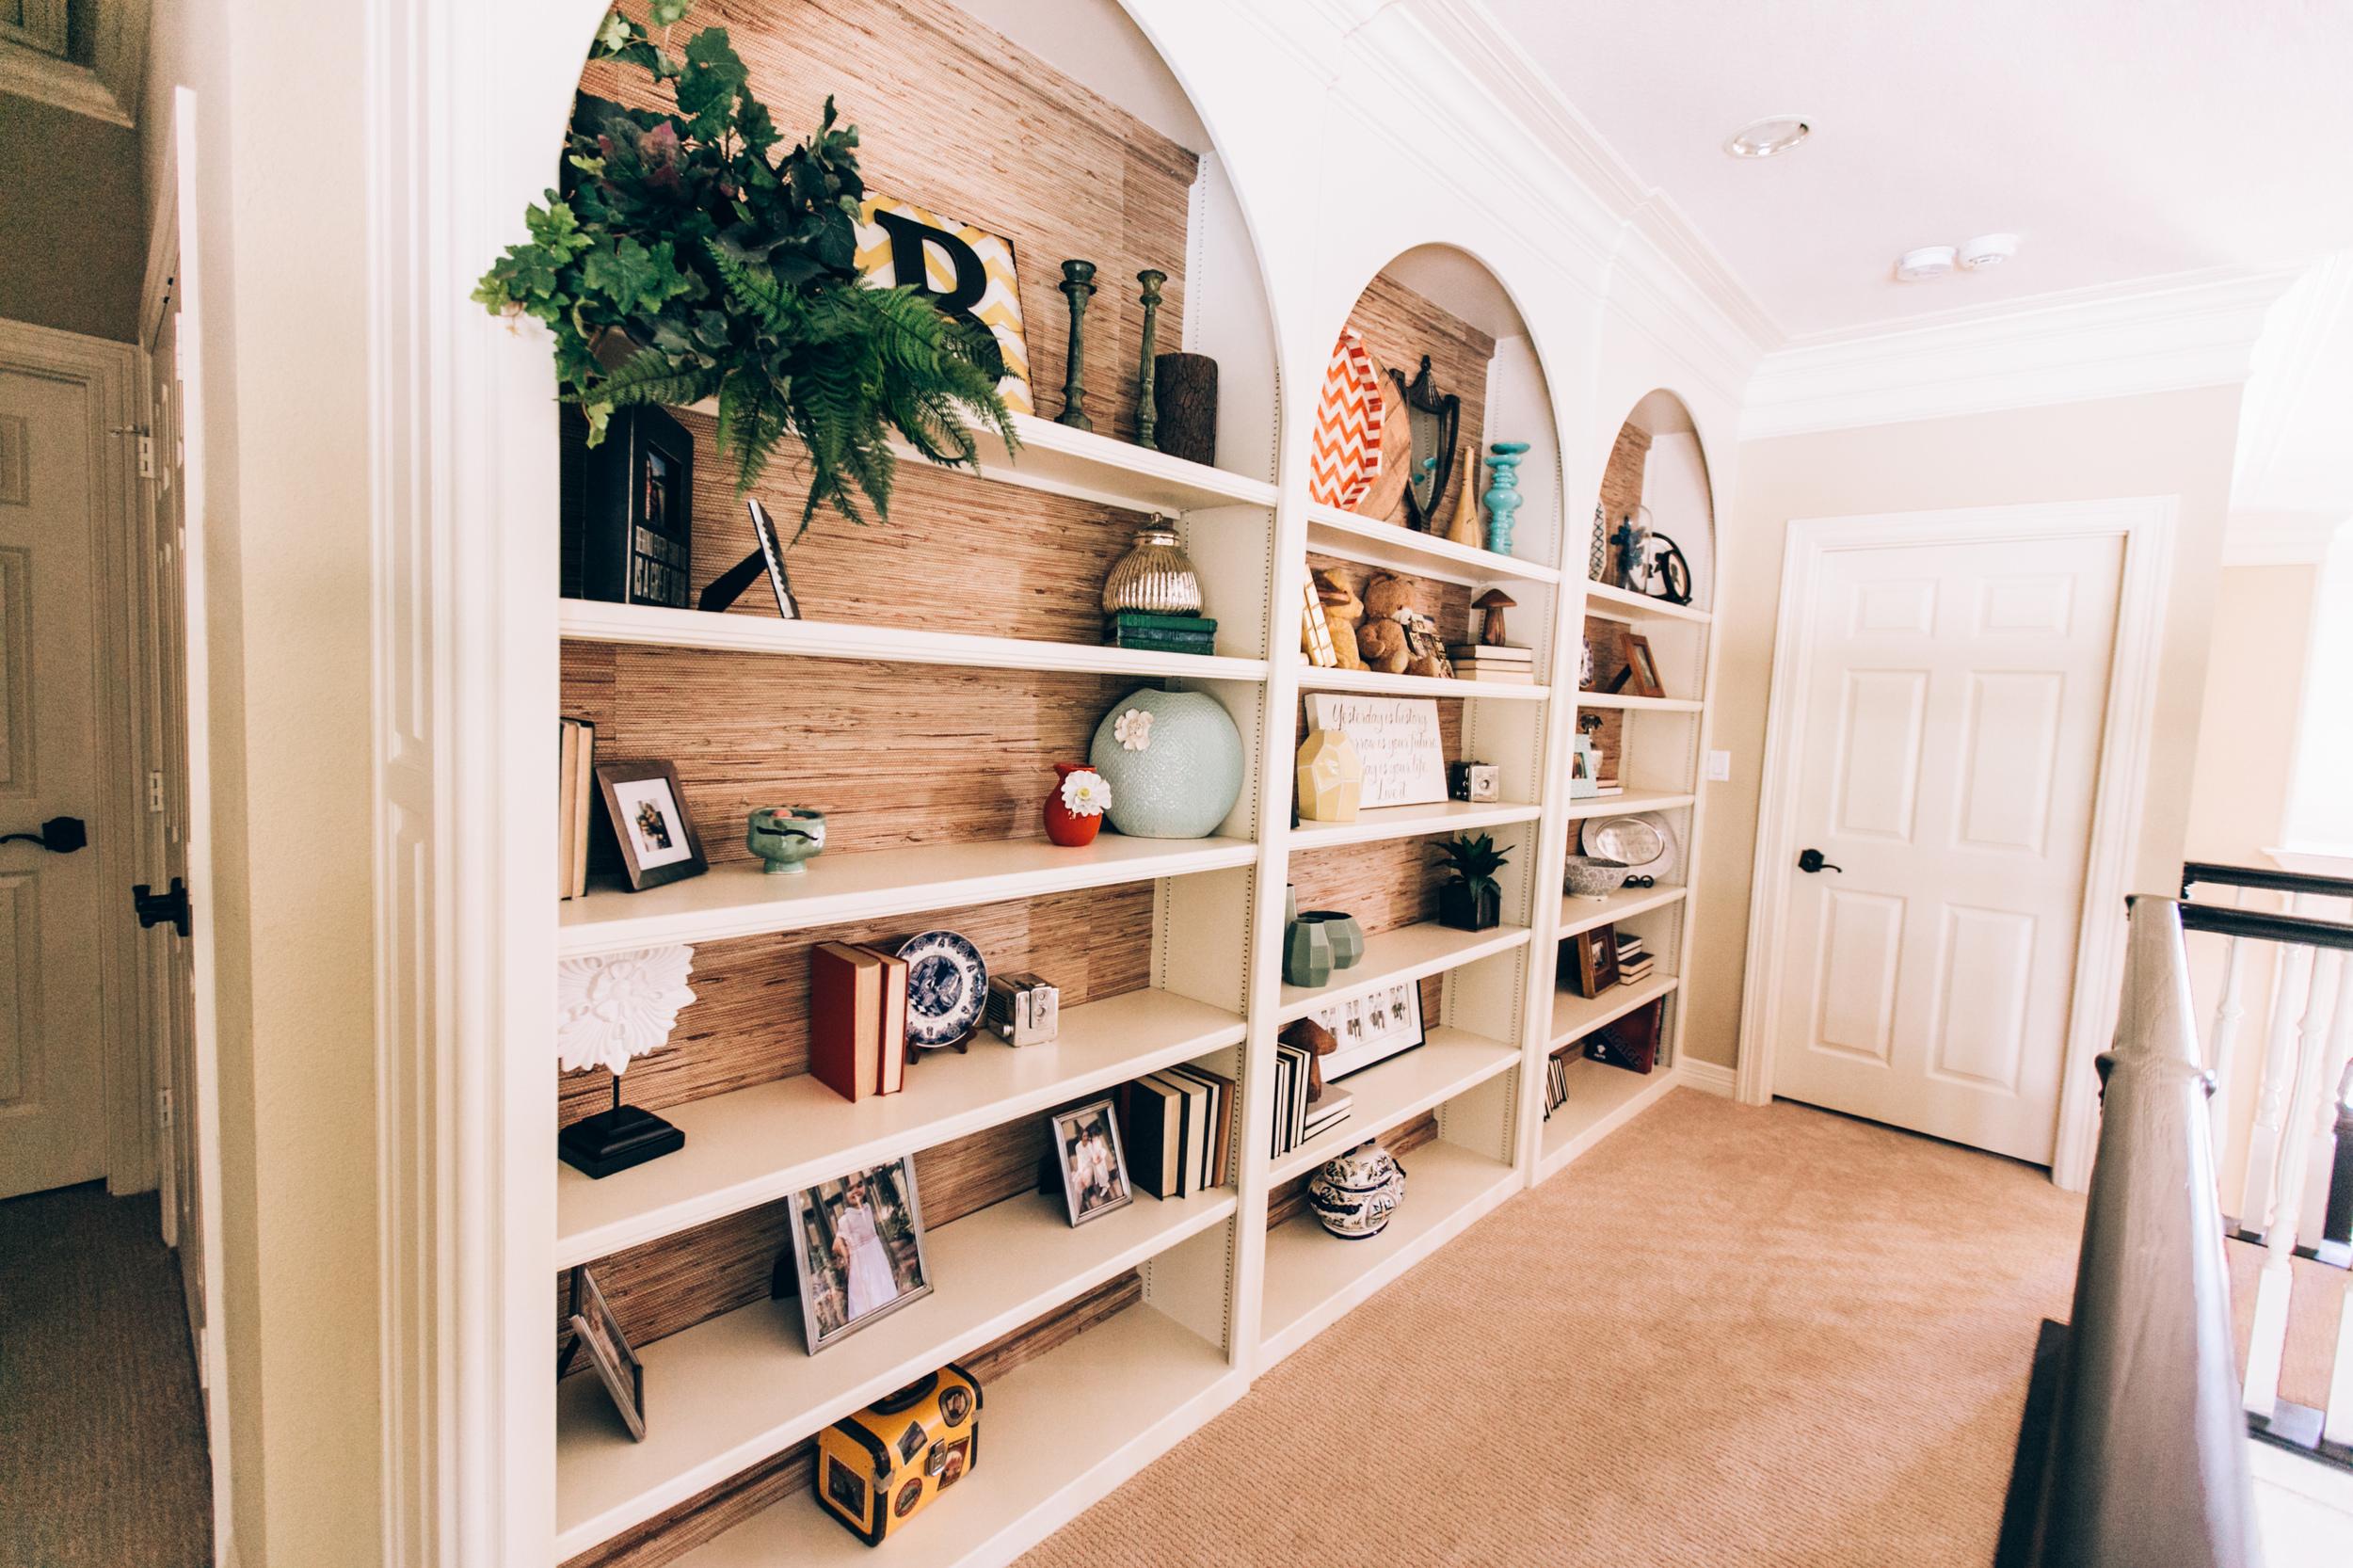 Styled Book Shelves